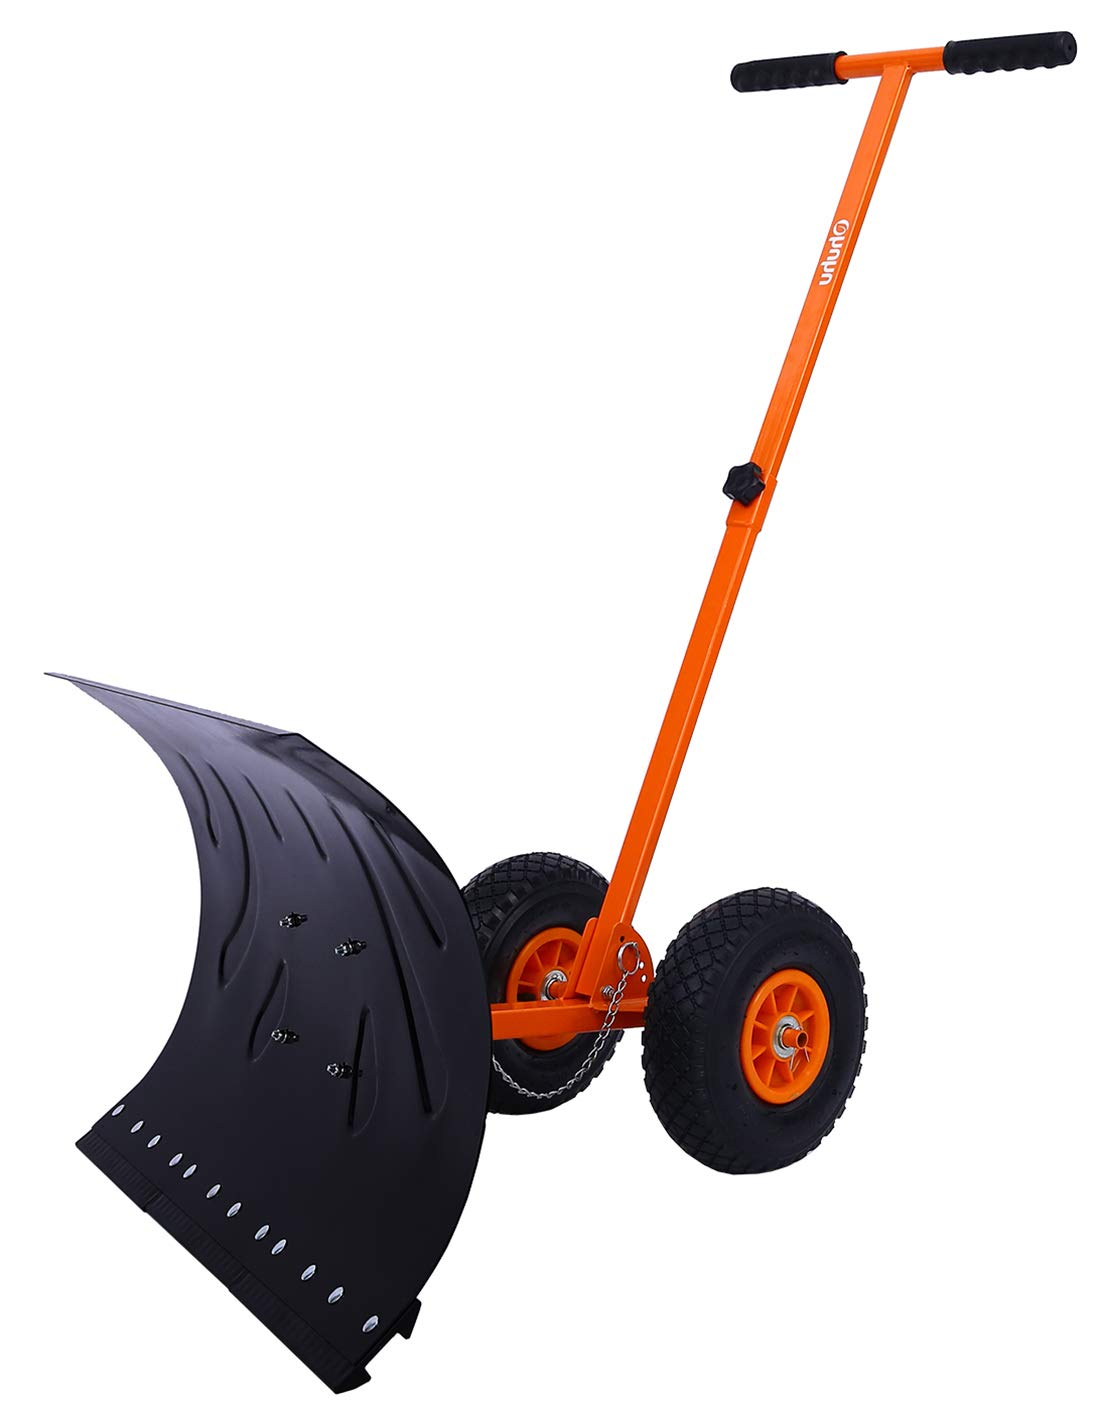 Nordic plow shovel stanley 16 piece socket set